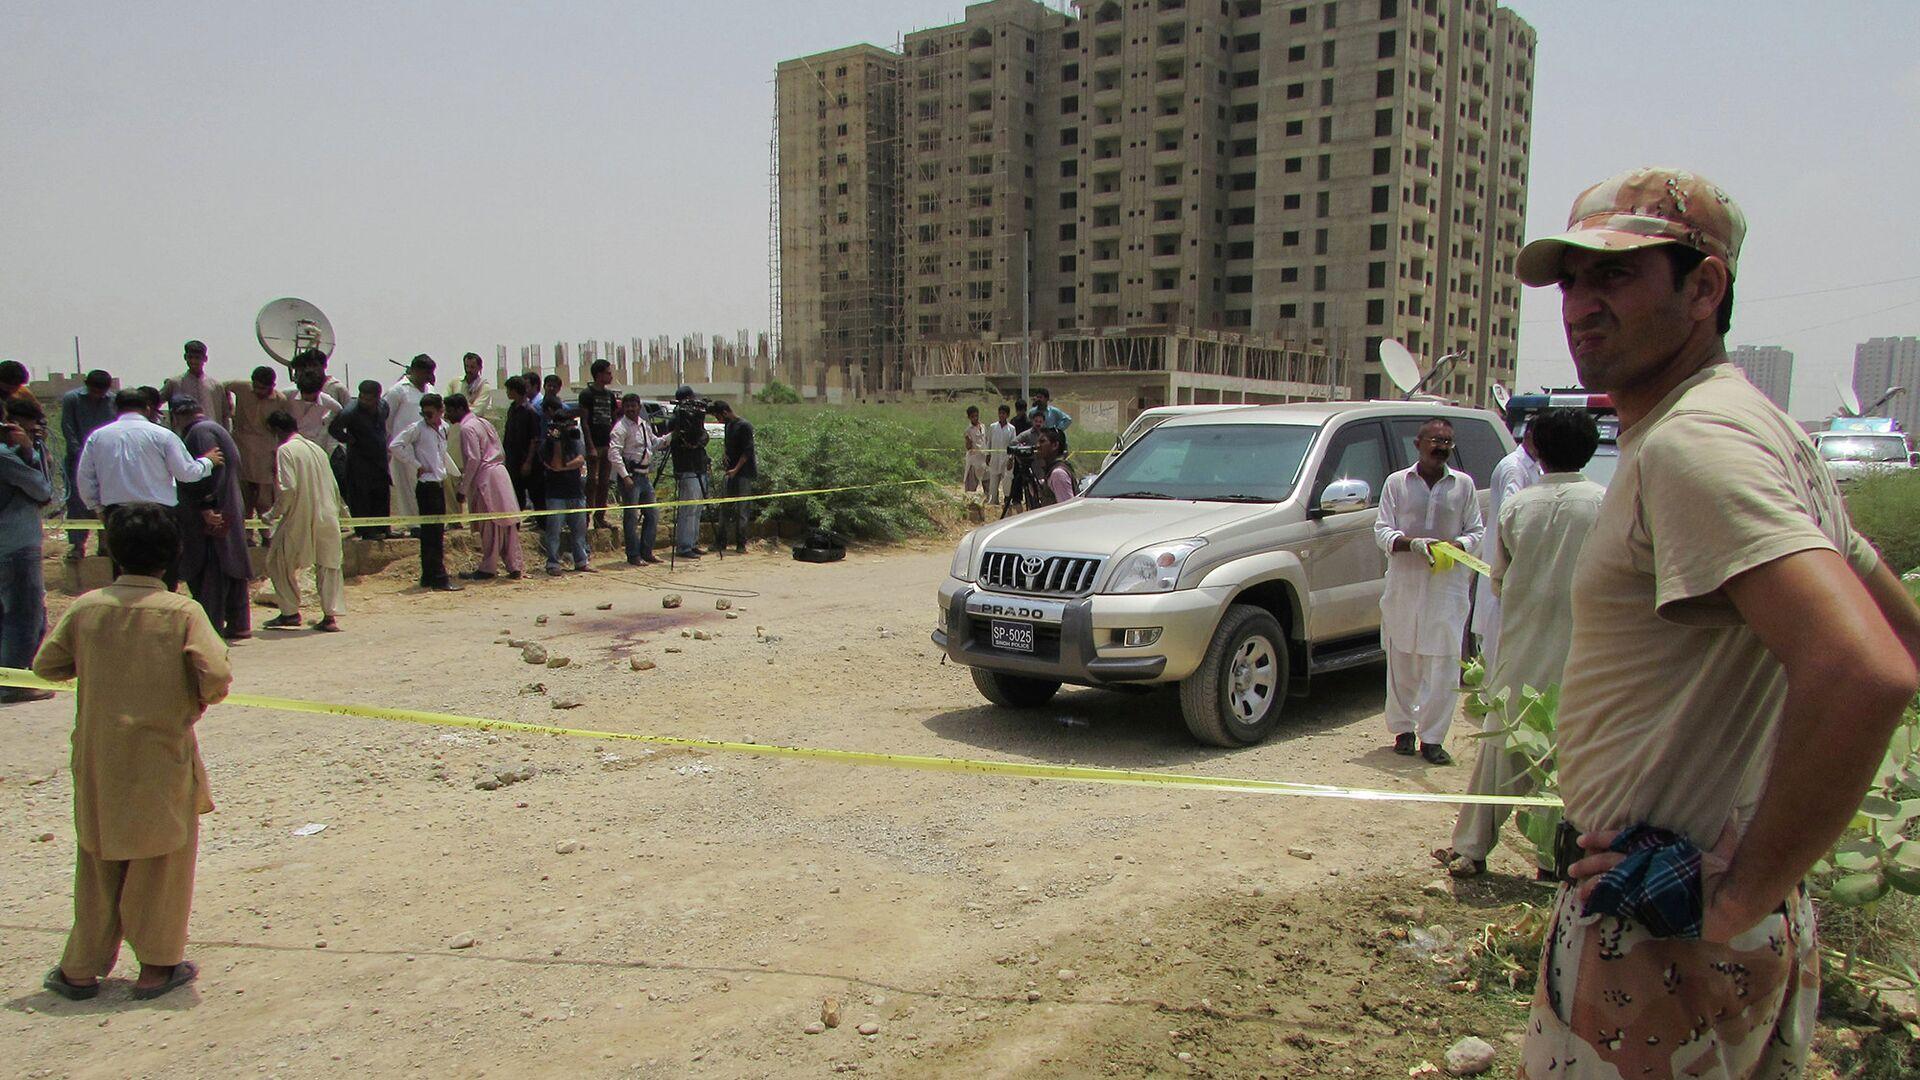 Полиция на месте обстрела автобуса в Пакистане. Карачи, 13 мая 2015 - РИА Новости, 1920, 27.09.2020